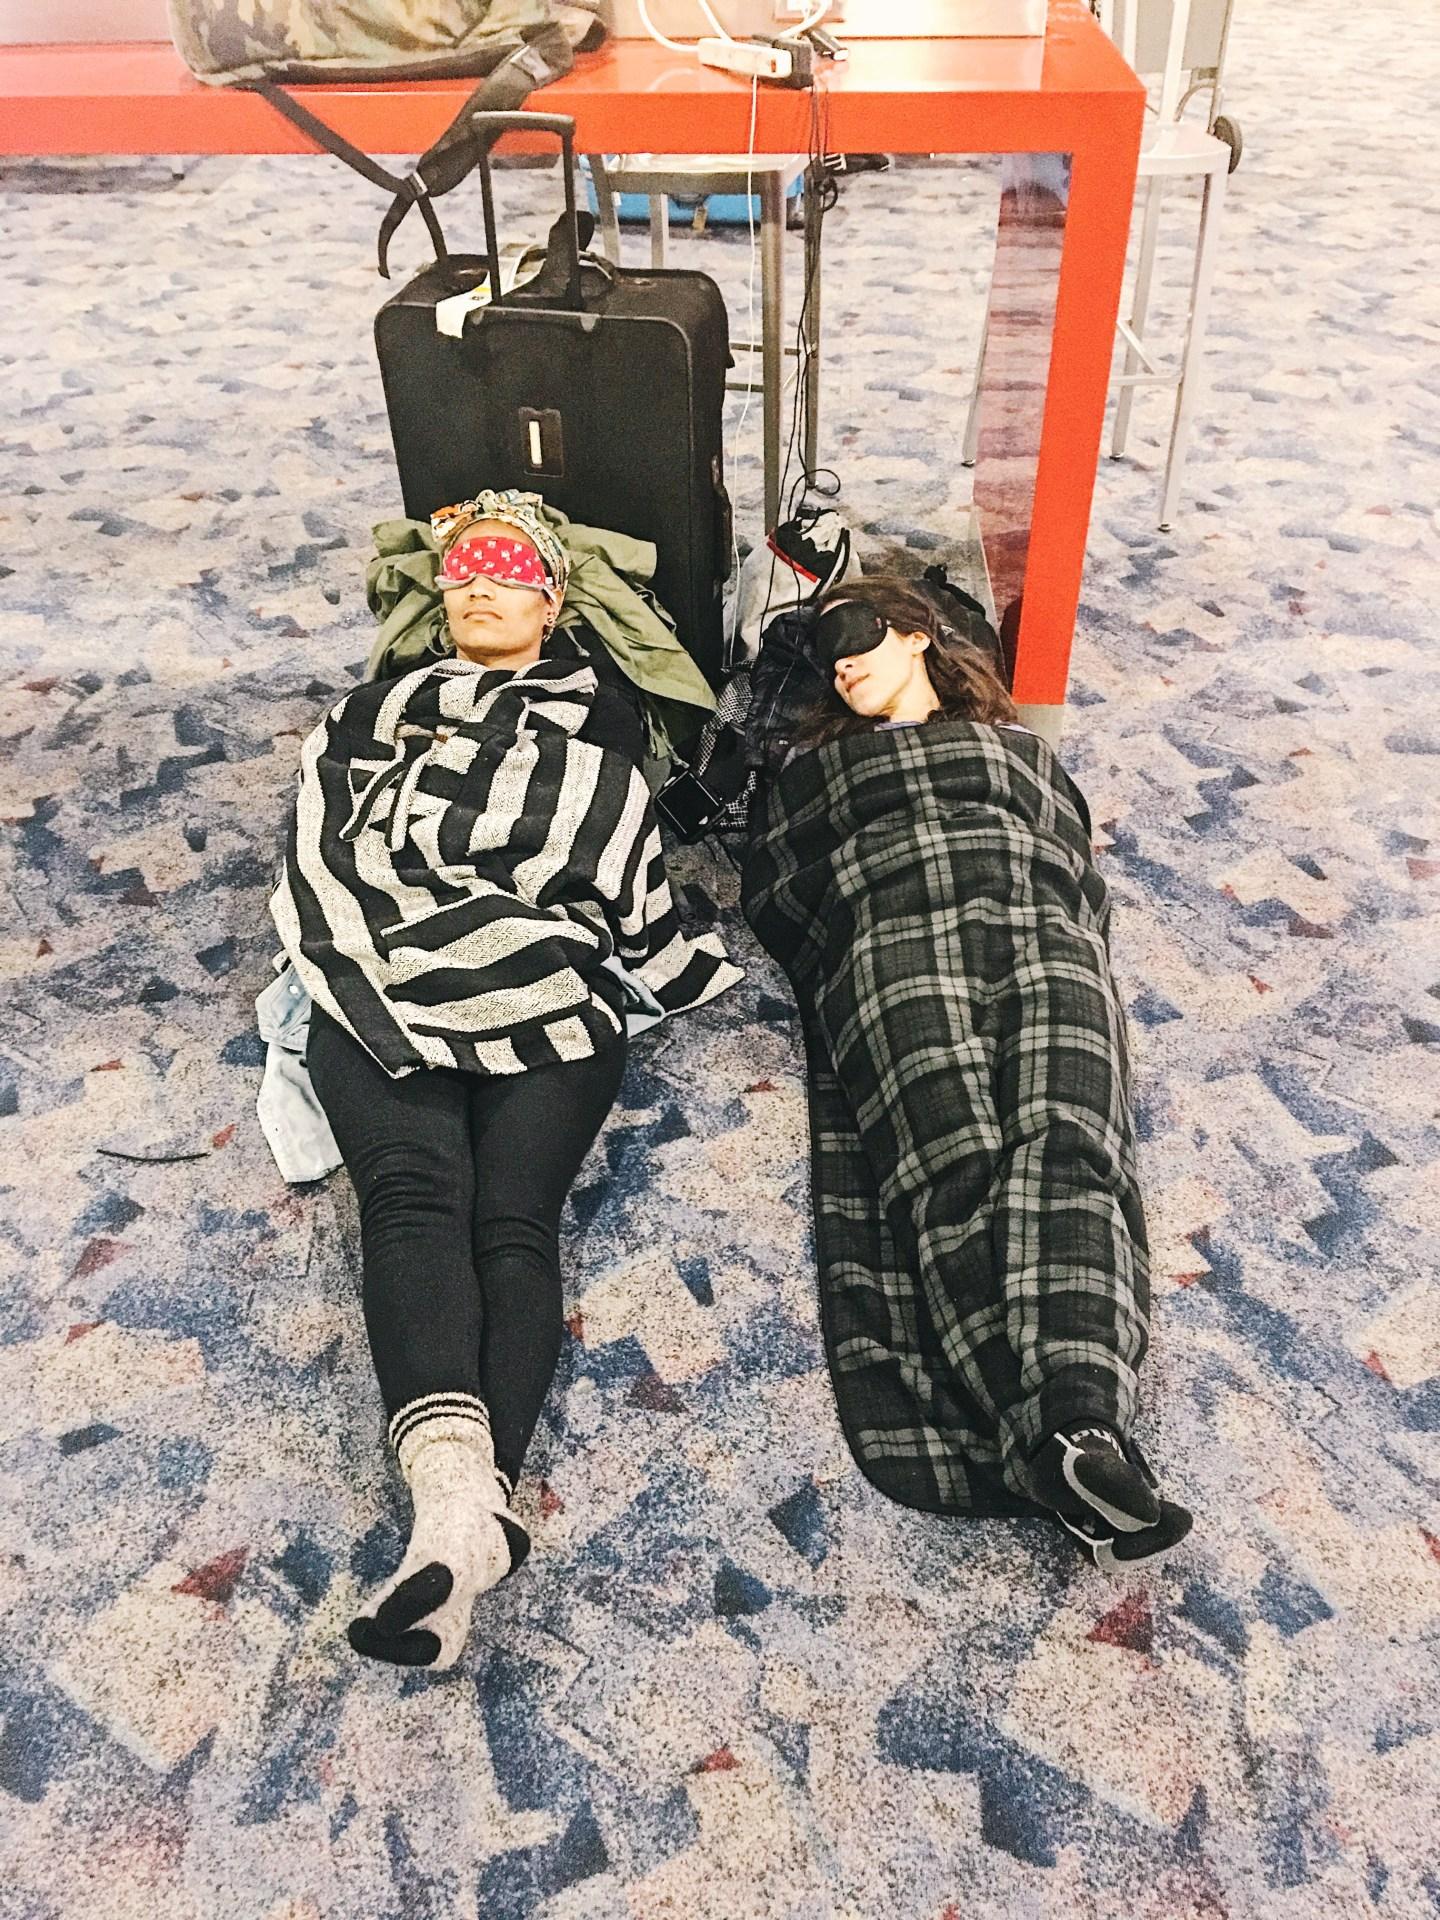 Illustrated by Sade - Sleeping in the McCarran Airport in Las Vegas Nevada